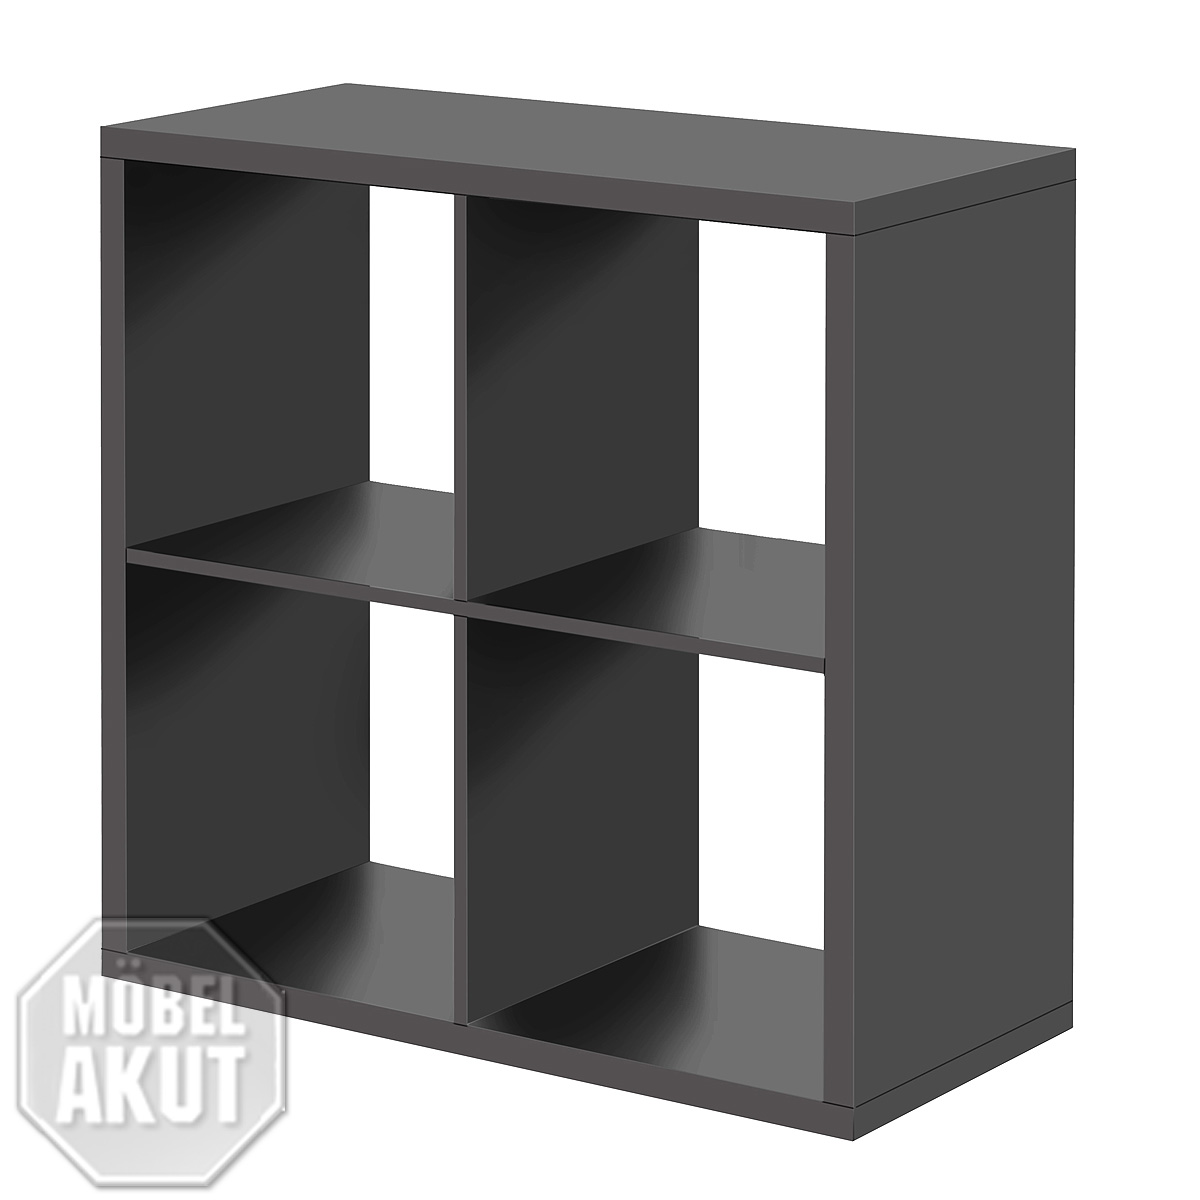 wrfel regal trendy cool ikea lack regal l cm with ikea. Black Bedroom Furniture Sets. Home Design Ideas